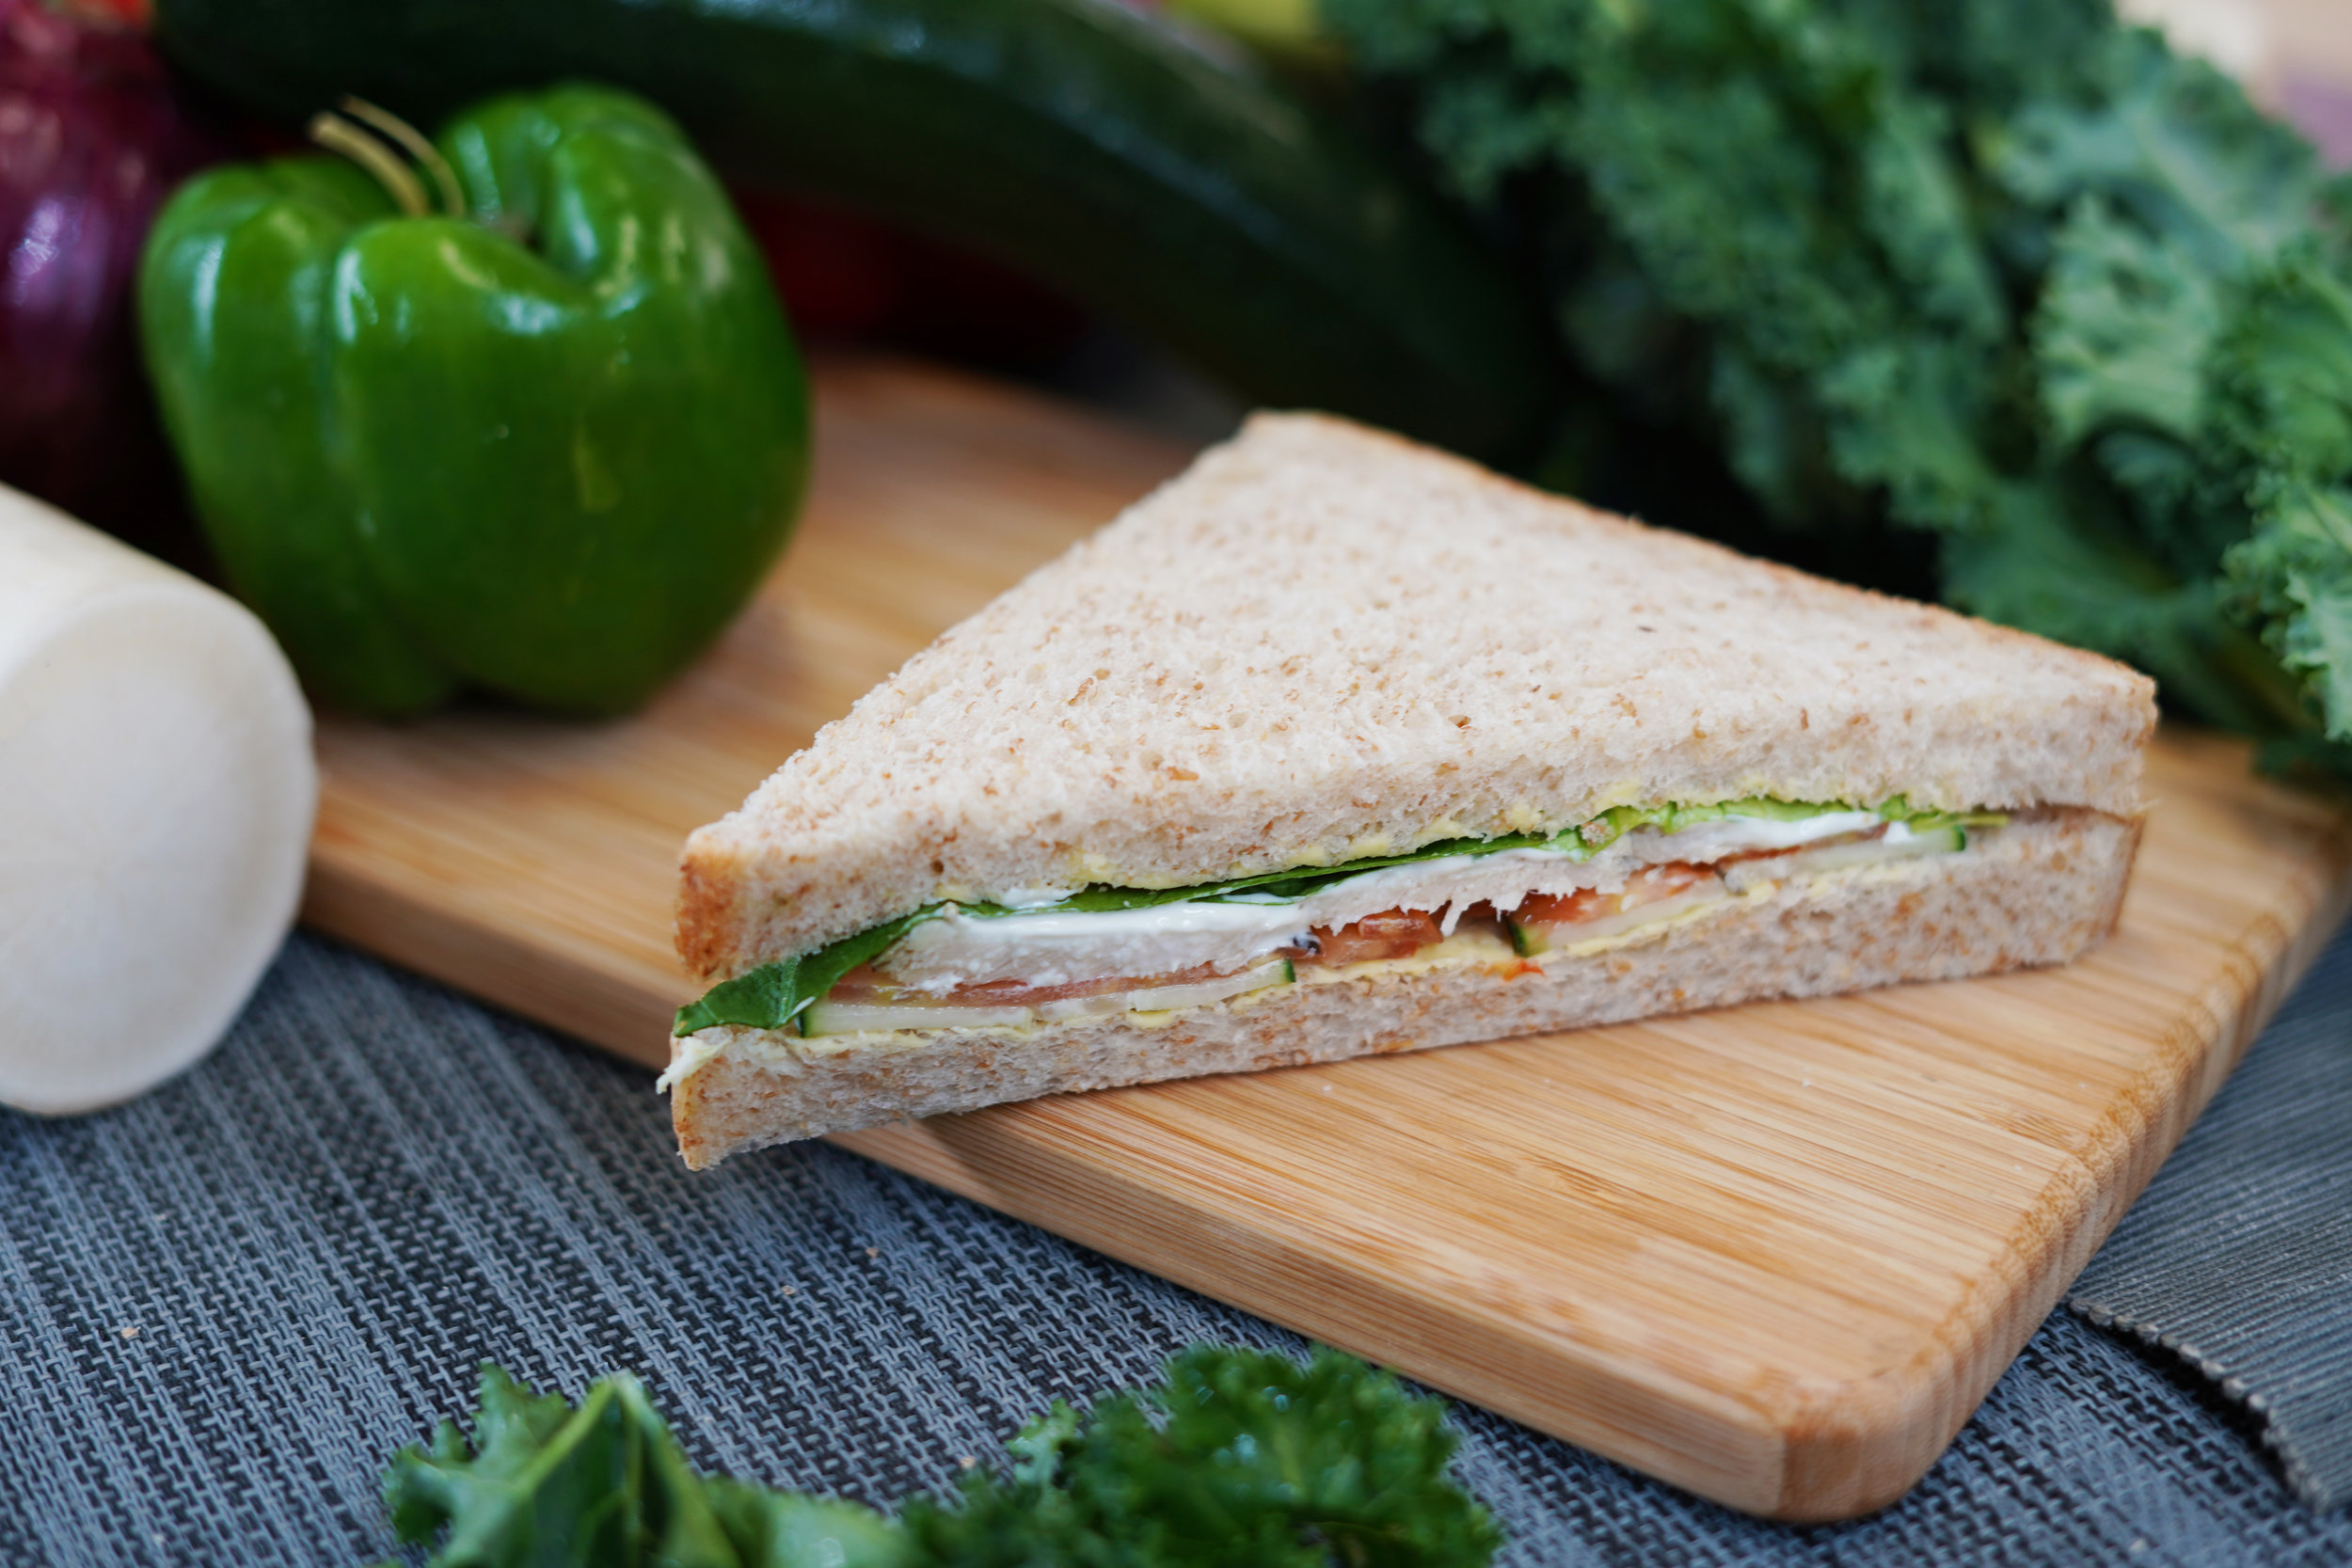 CHICKEN SANDWICH - 202.4 KCAL PER SERVINGHerbed Chicken Breast, Tomato, Cucumber, Lettuce Butter, Whole Wheat Bread$25